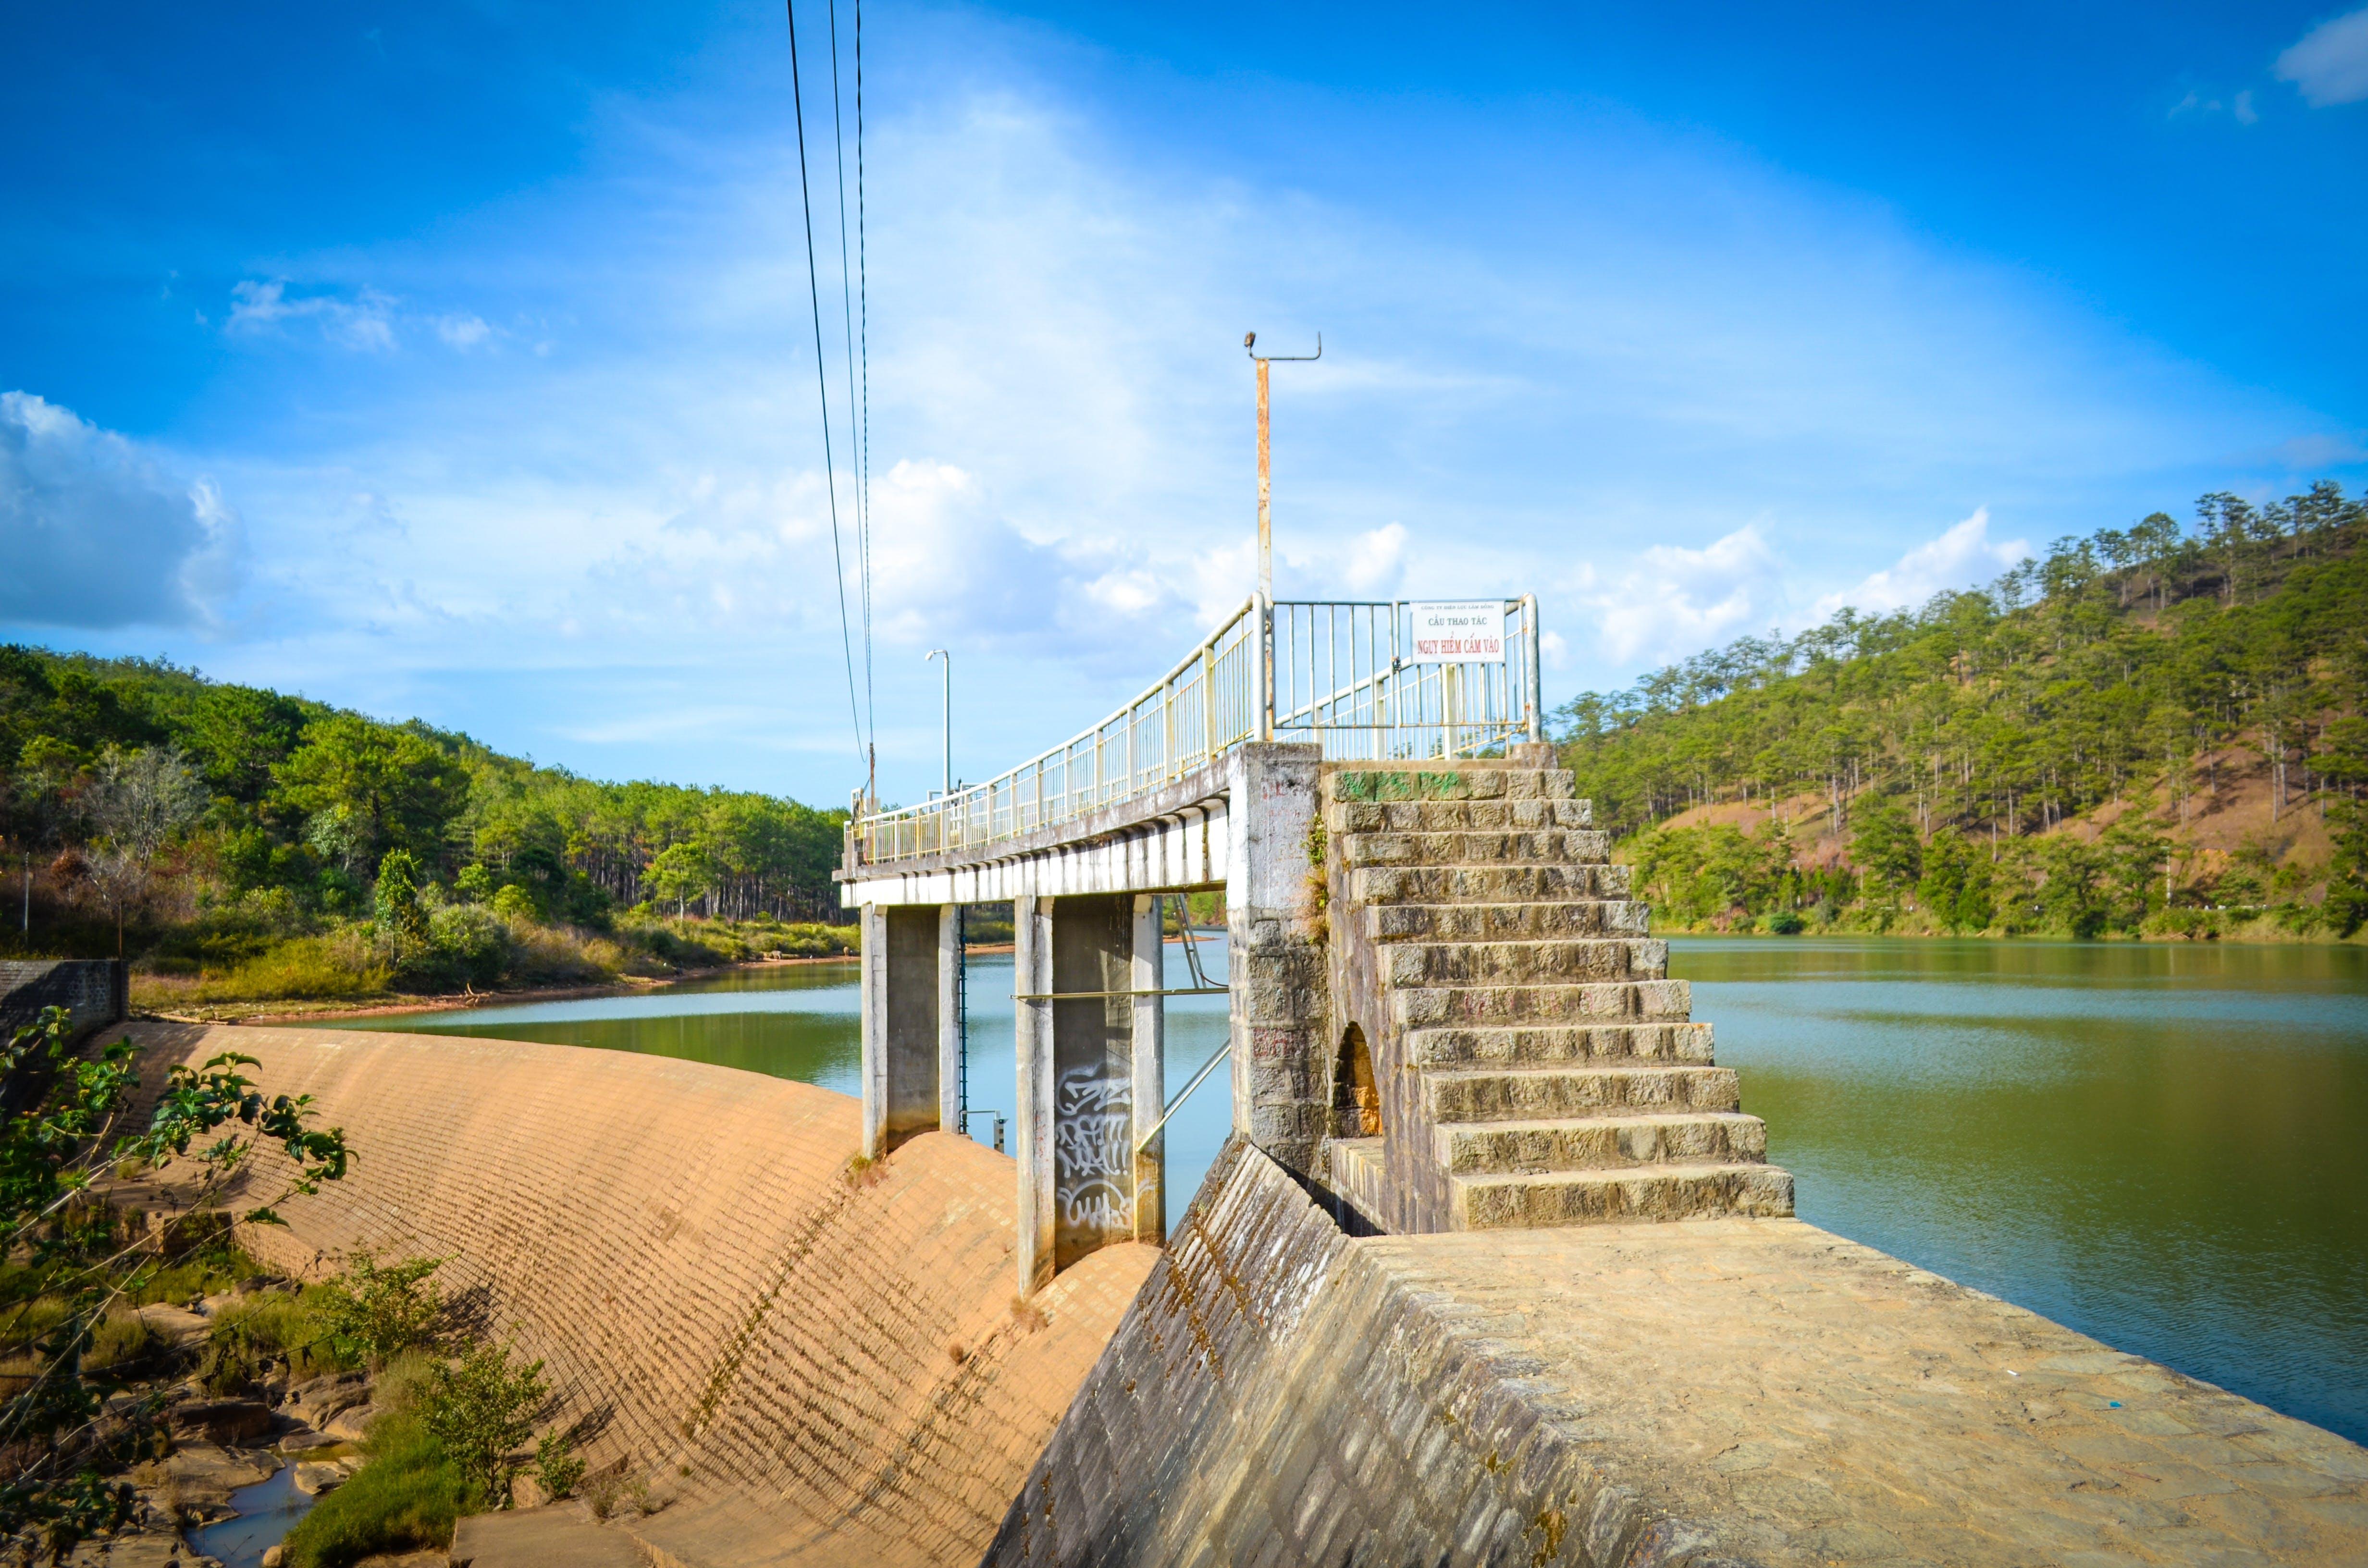 Free stock photo of dams